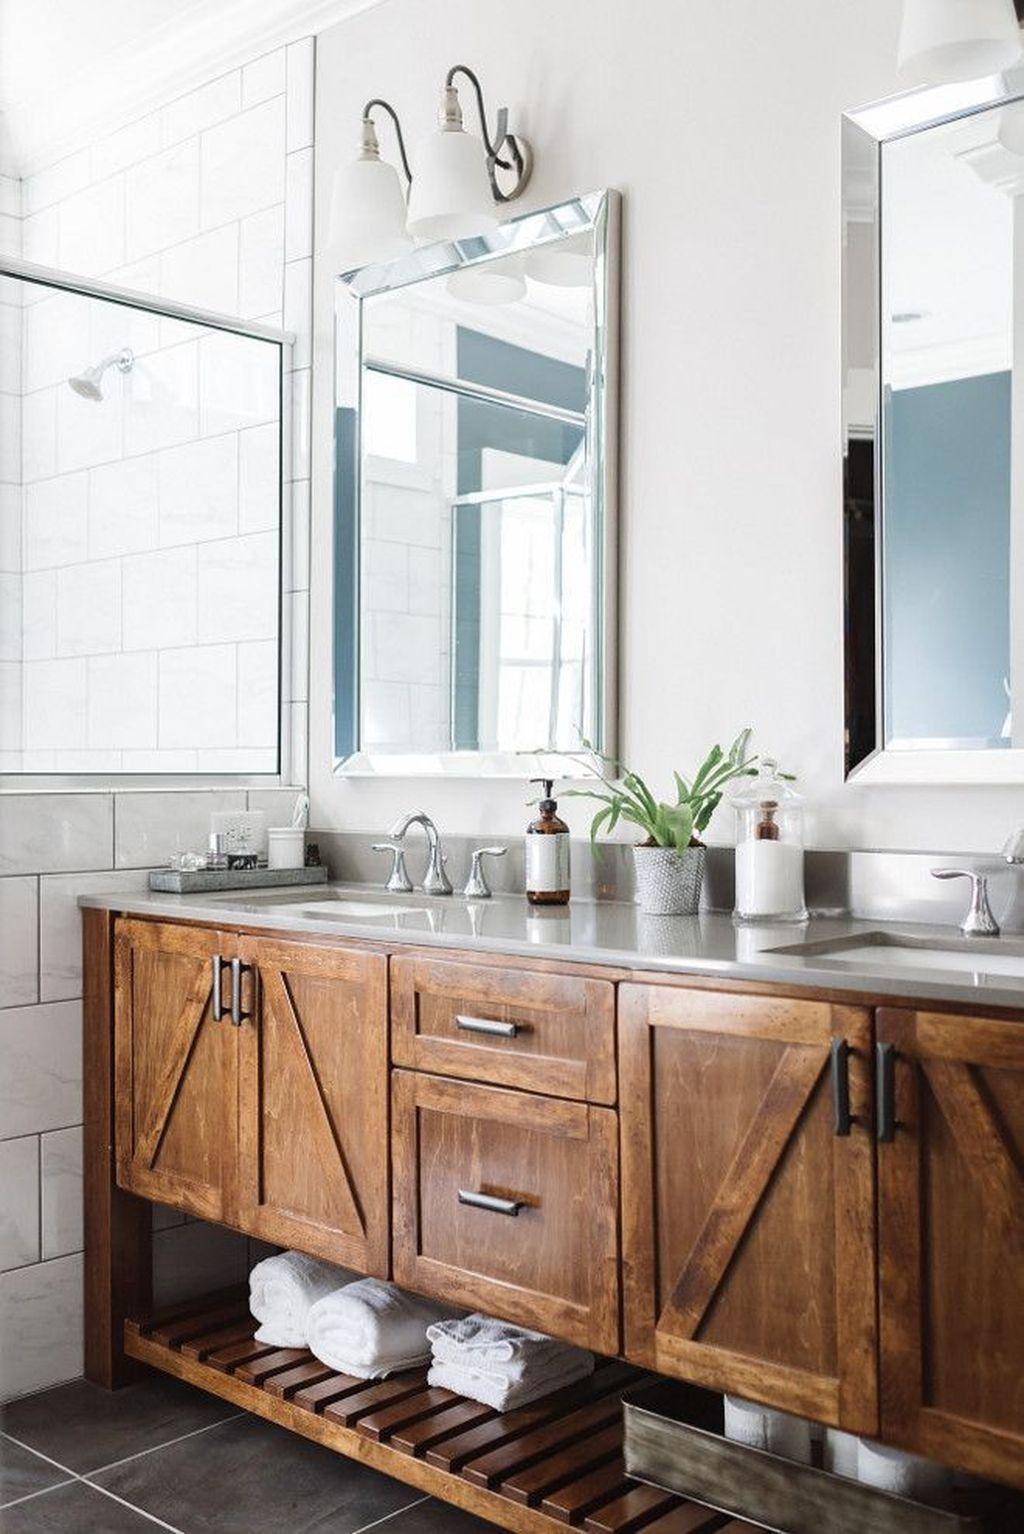 Modern Rustic Farmhouse Style Master Bathroom Ideas 33 | home ideas ...